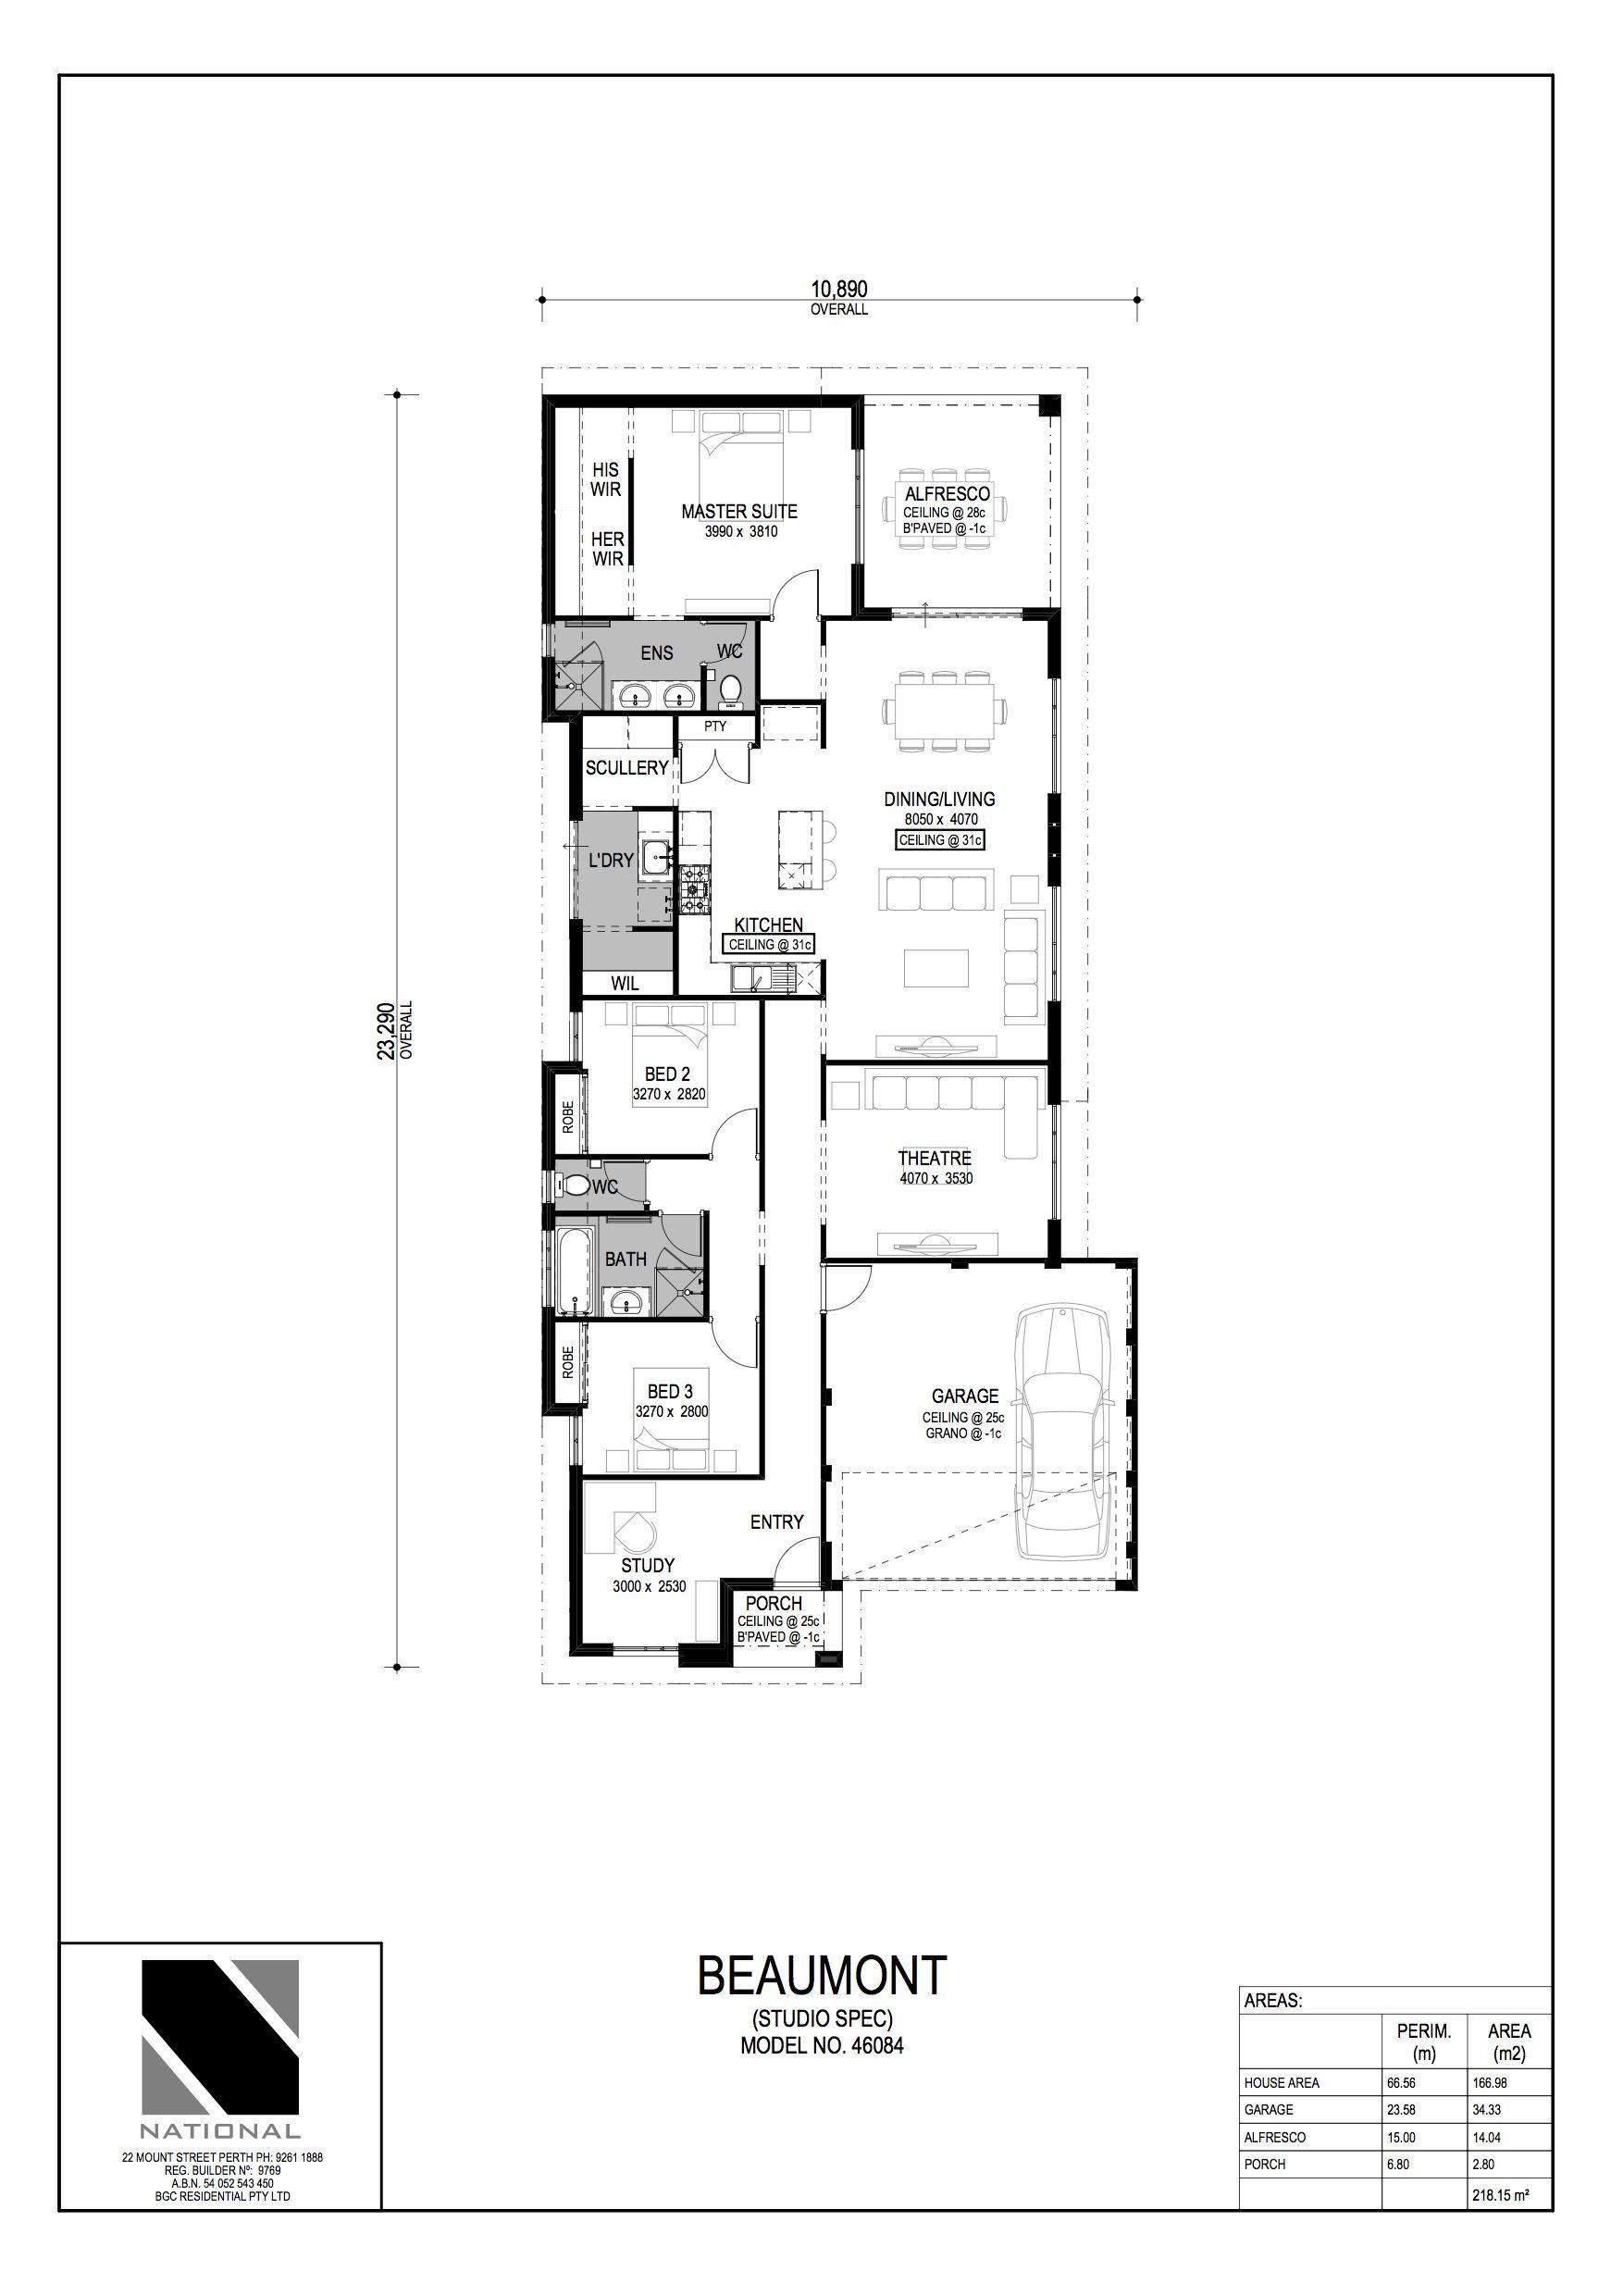 0d1b6e63ea4336f418d3b411a09df8c4 Top Result 50 Beautiful Luxury townhouse Floor Plans Image 2017 Zat3